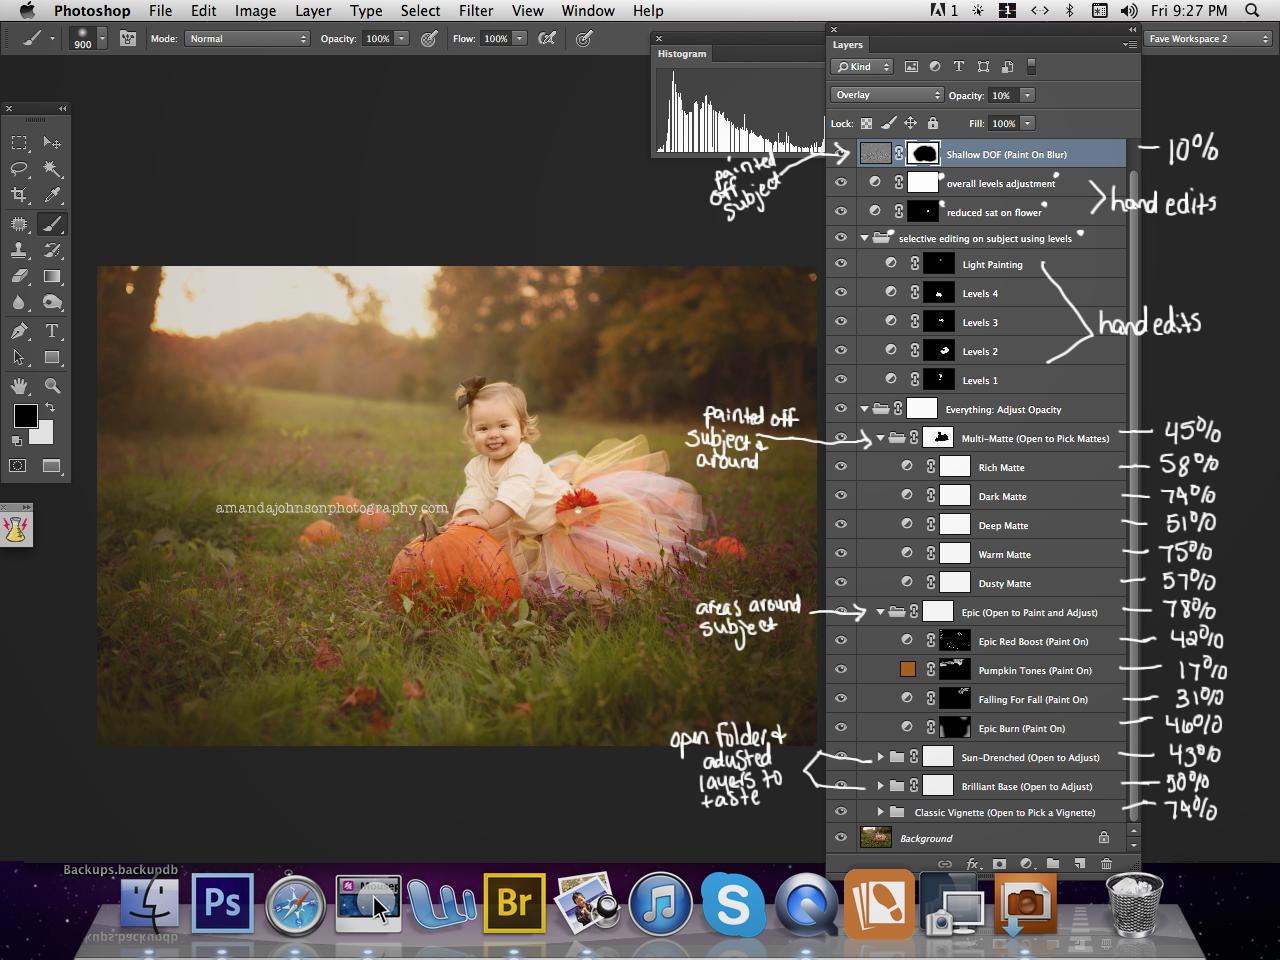 mcpscreenshot-copy Fall Portrait Workflow Using MCP Inspire Action Set Blueprints Guest Bloggers Photoshop Actions Photoshop Tips & Tutorials